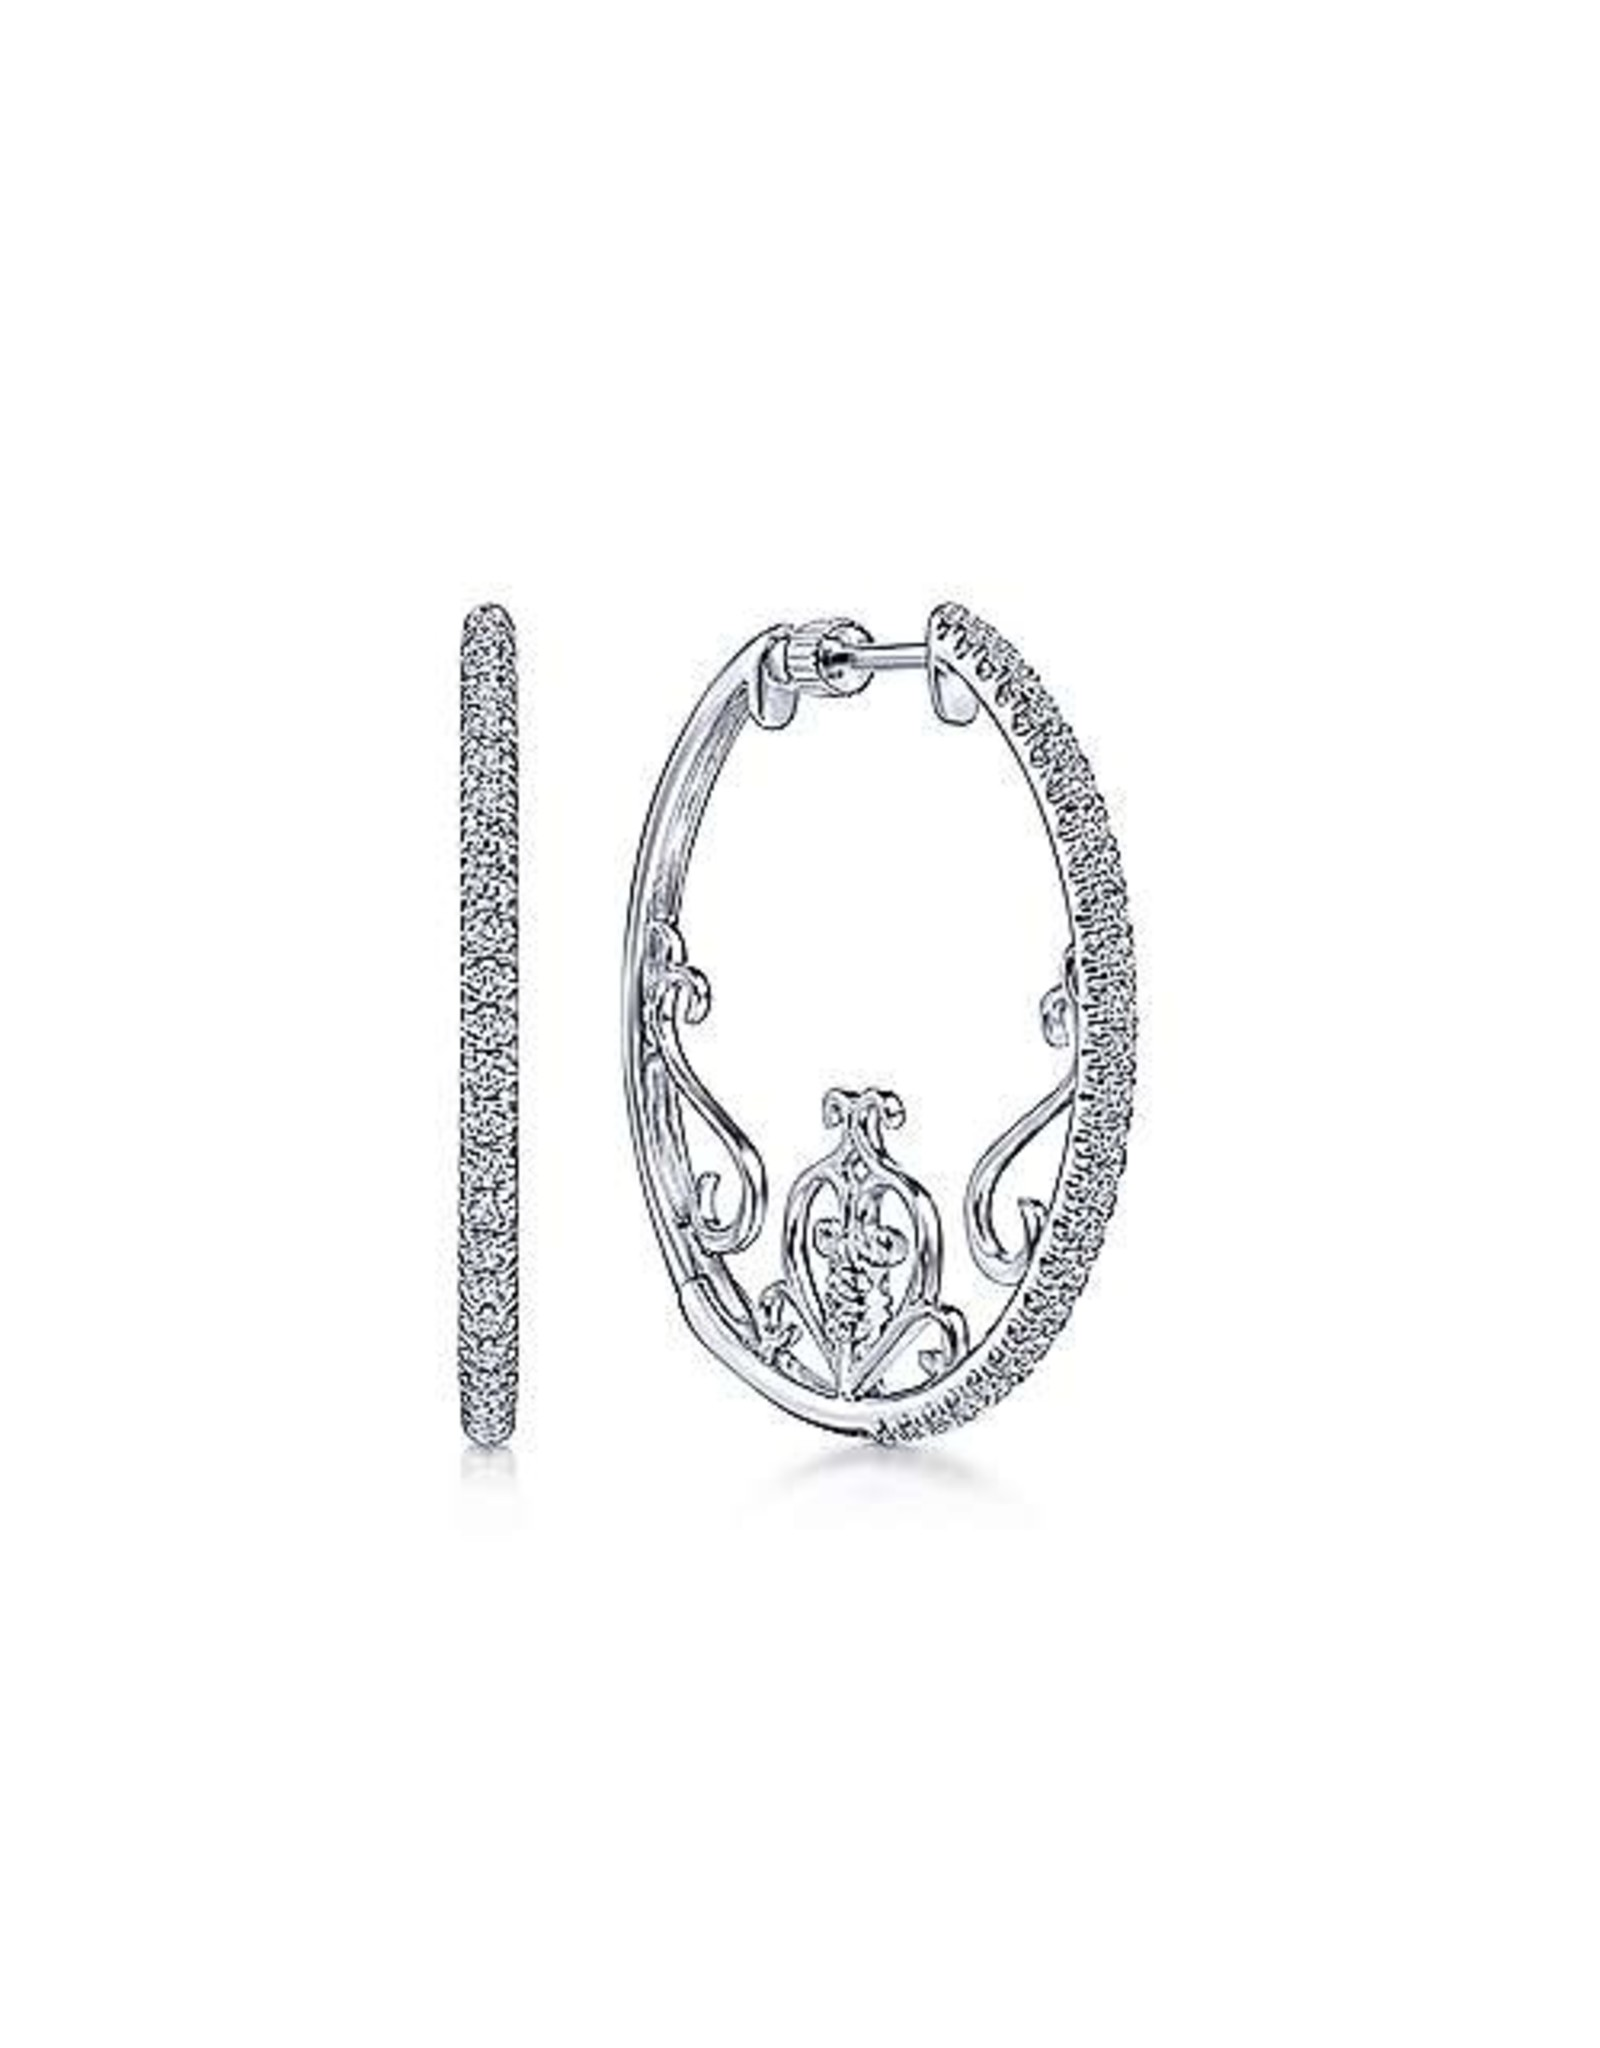 14K White Gold 25mm Intricate Diamond Hoops, D: 0.61ct